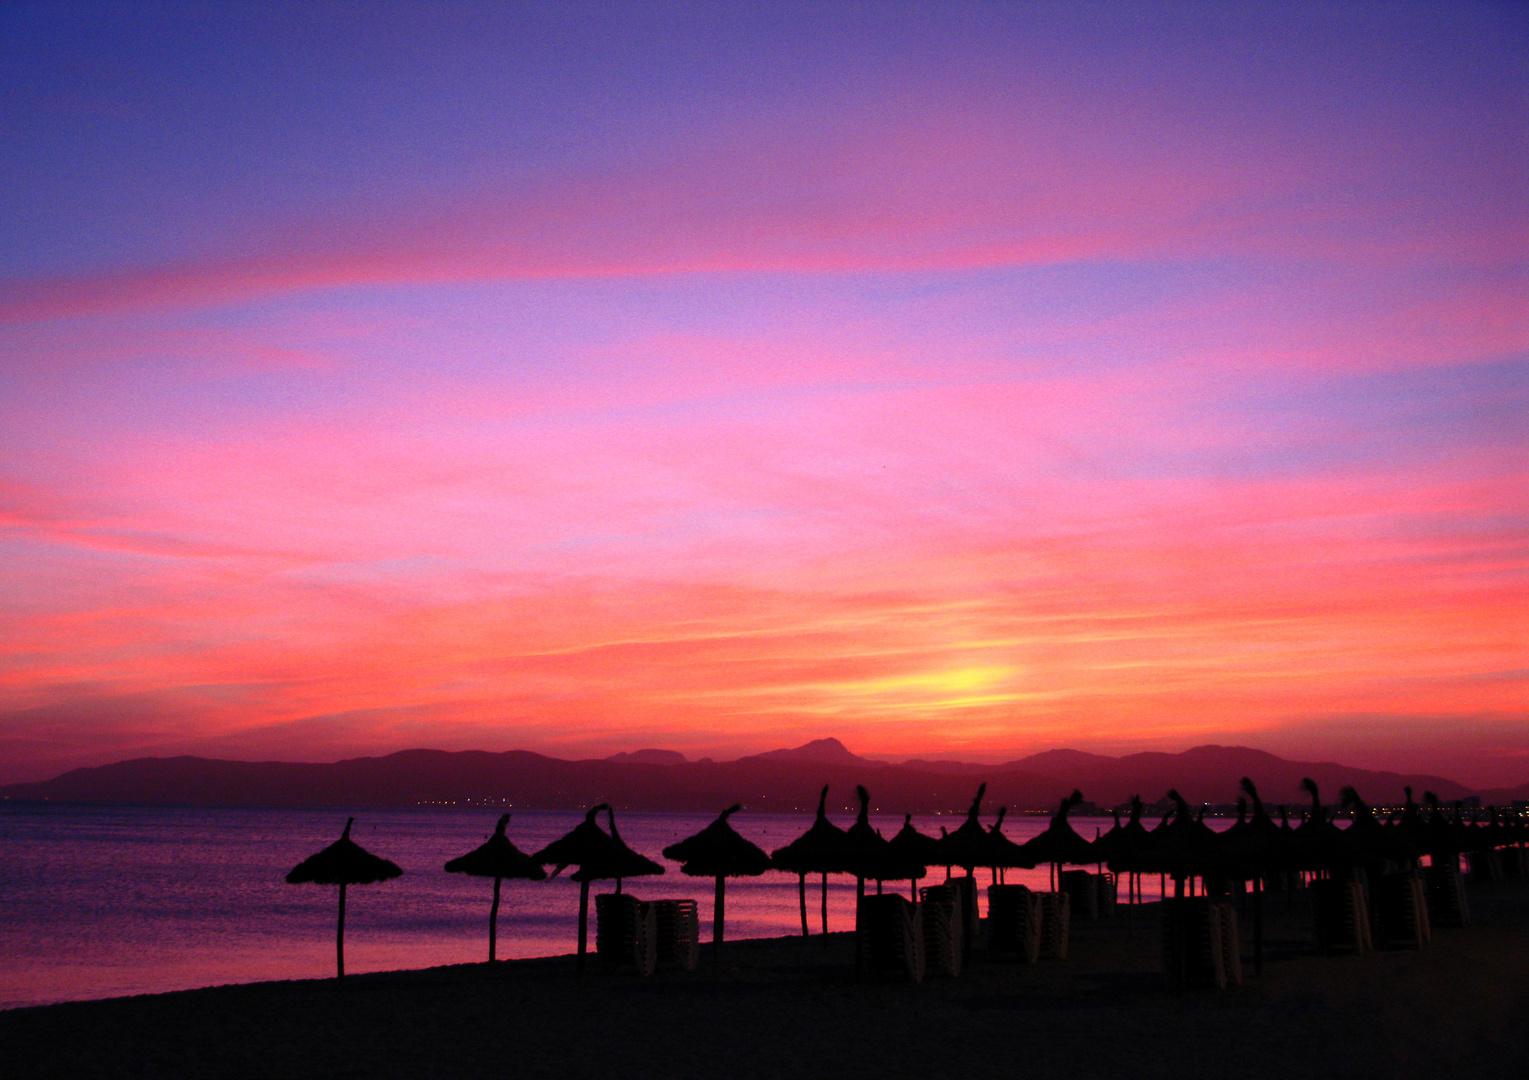 Sonnenuntergang auf Palma